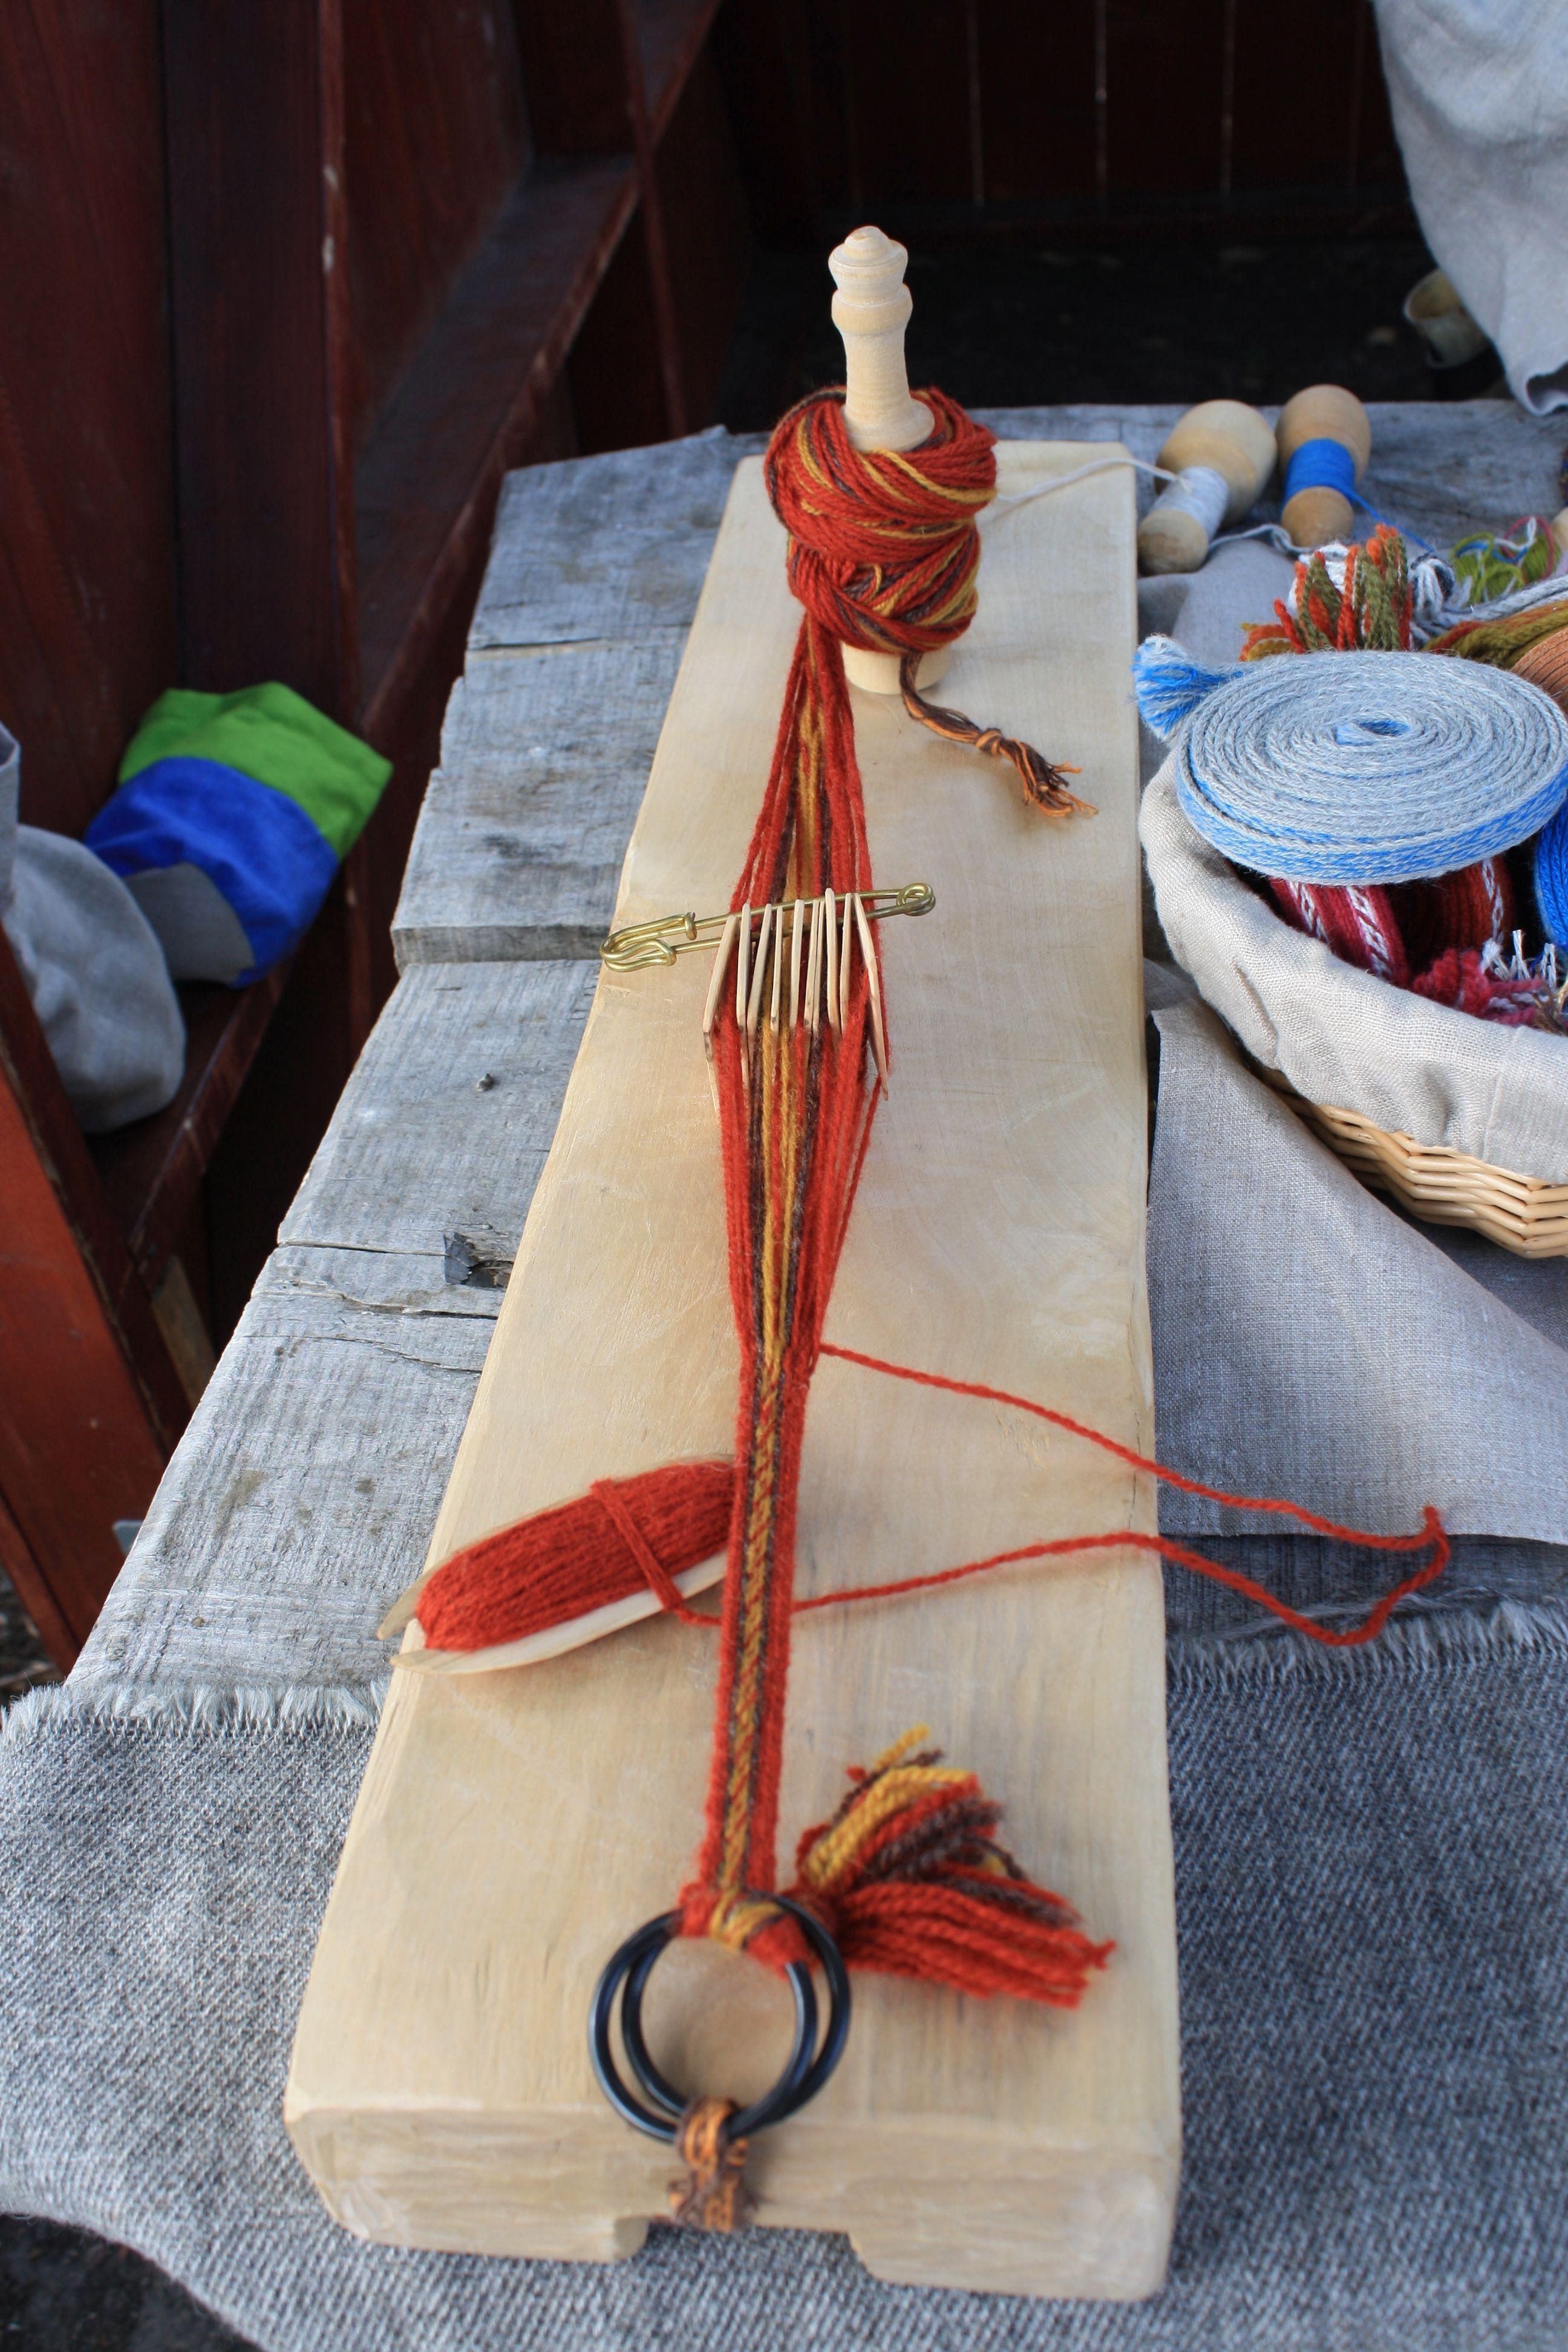 Pin By Shannon Ward On 2 Going Viking Card Weaving Loom Weaving Tablet Weaving Patterns